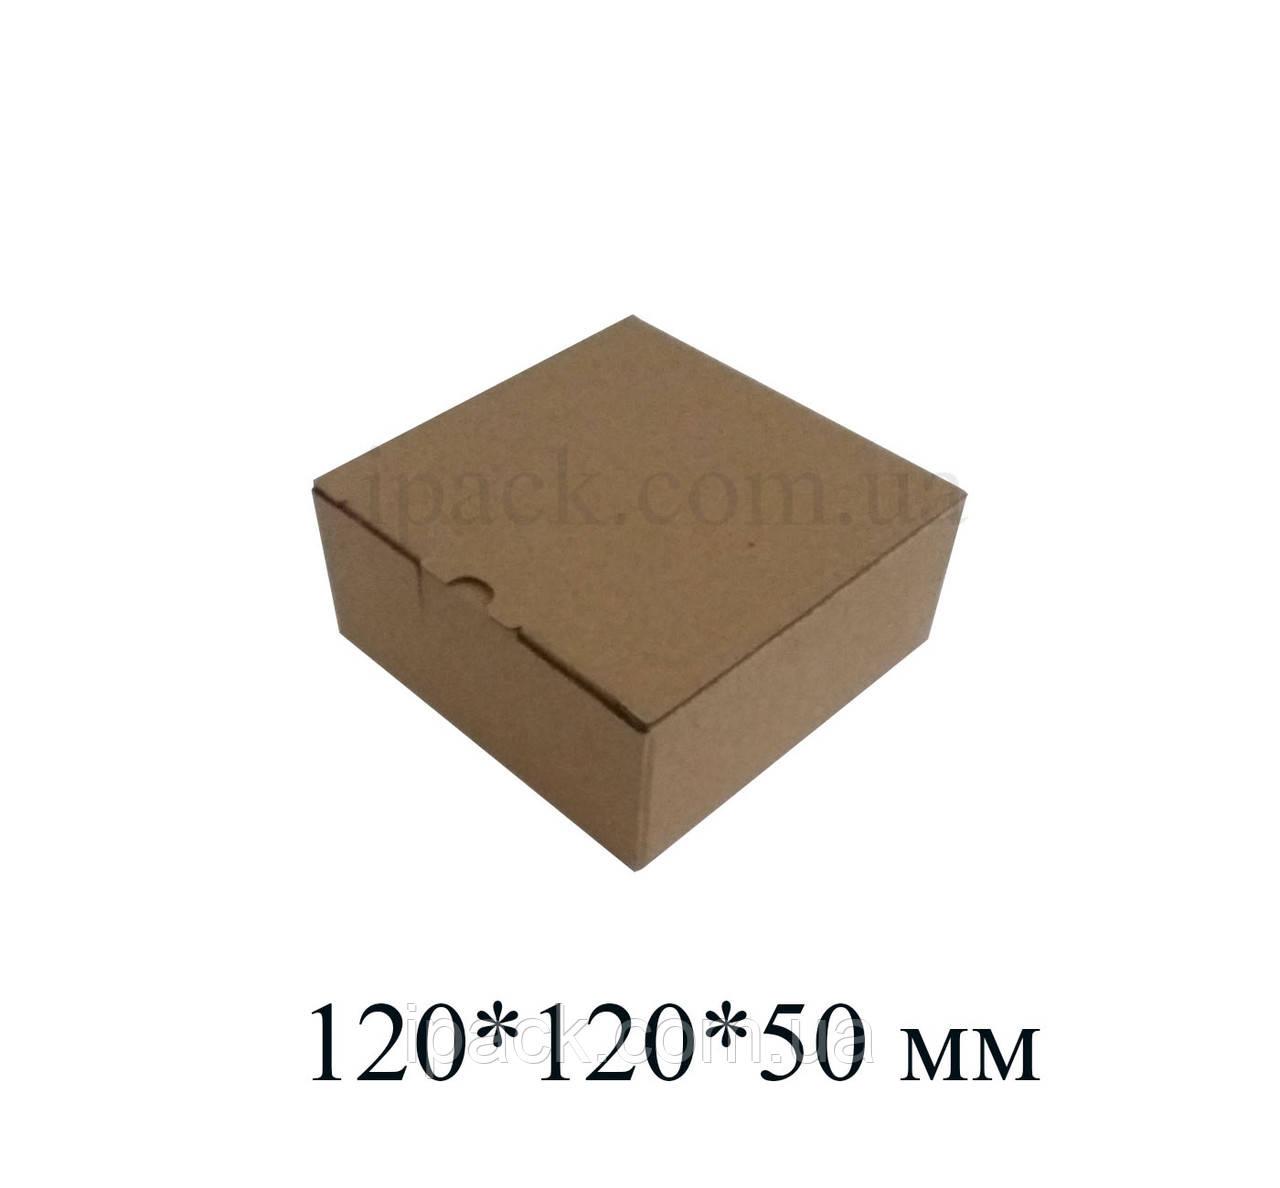 Коробка картонная самосборная, 120*120*50, мм, бурая,  крафт, микрогофрокартон